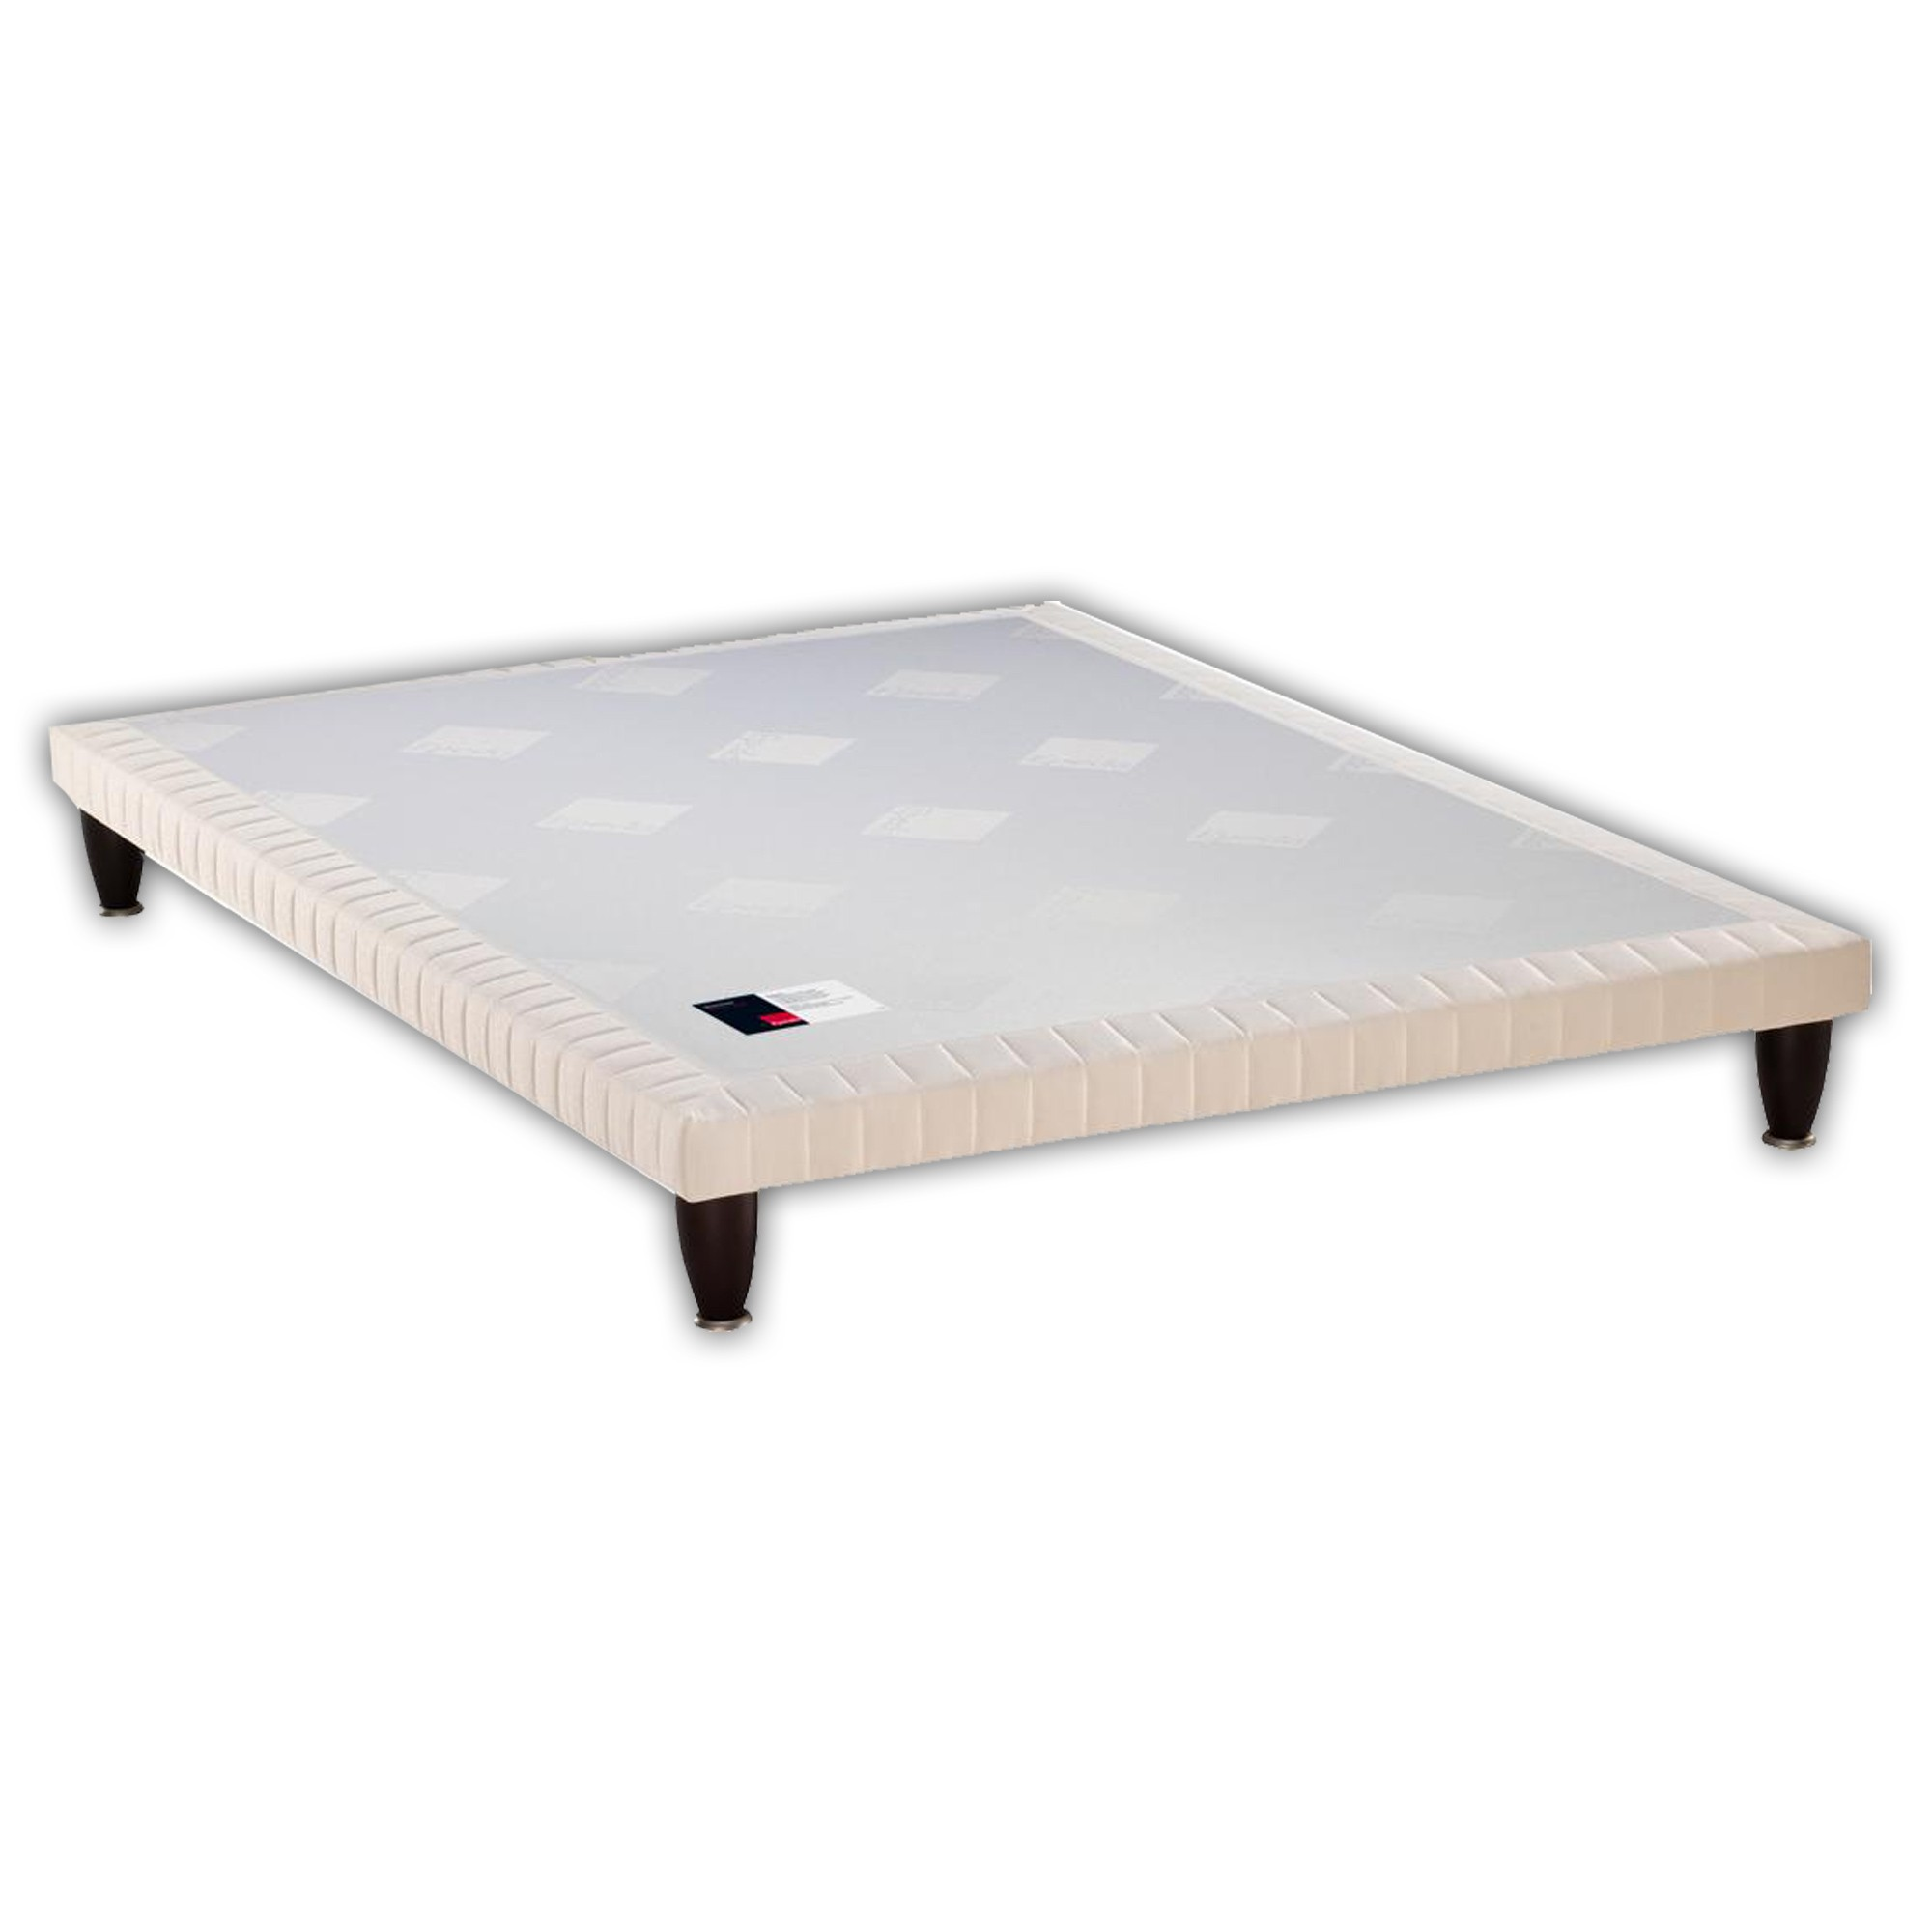 acheter sommier epeda extra plat 3 zones confort m dium pas cher avenue literie. Black Bedroom Furniture Sets. Home Design Ideas